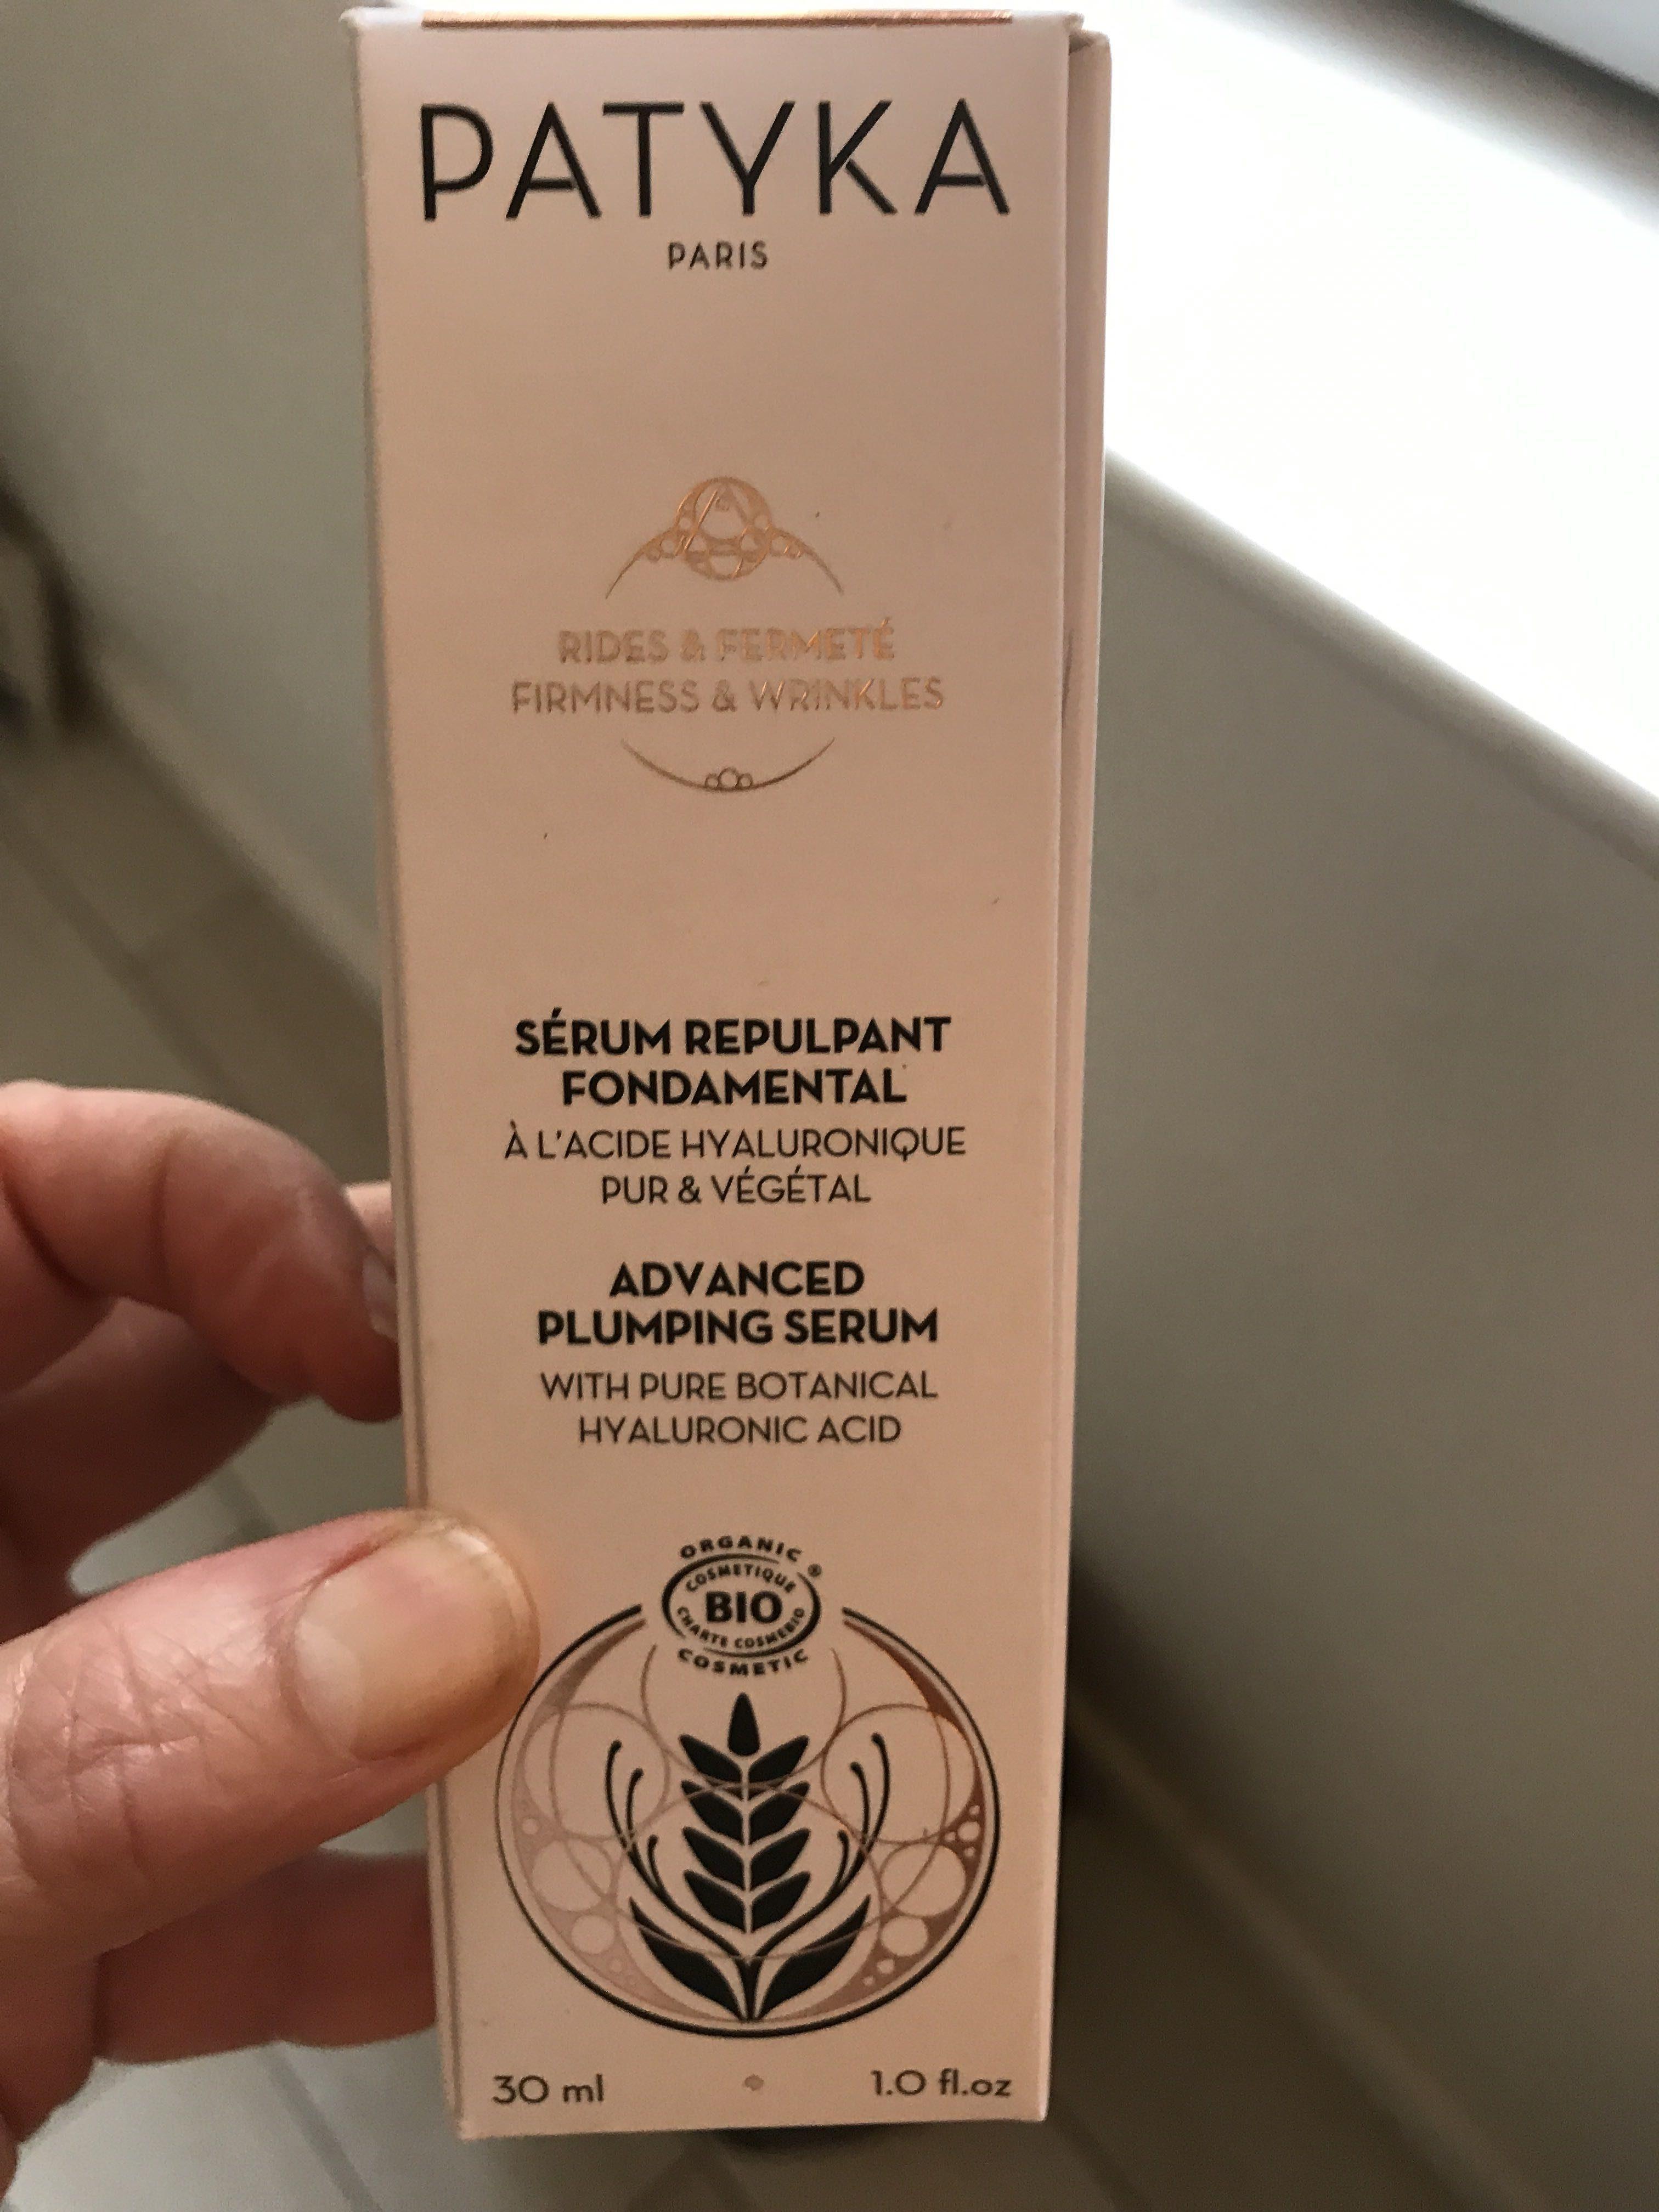 Sérum repulpant fondamental - Produit